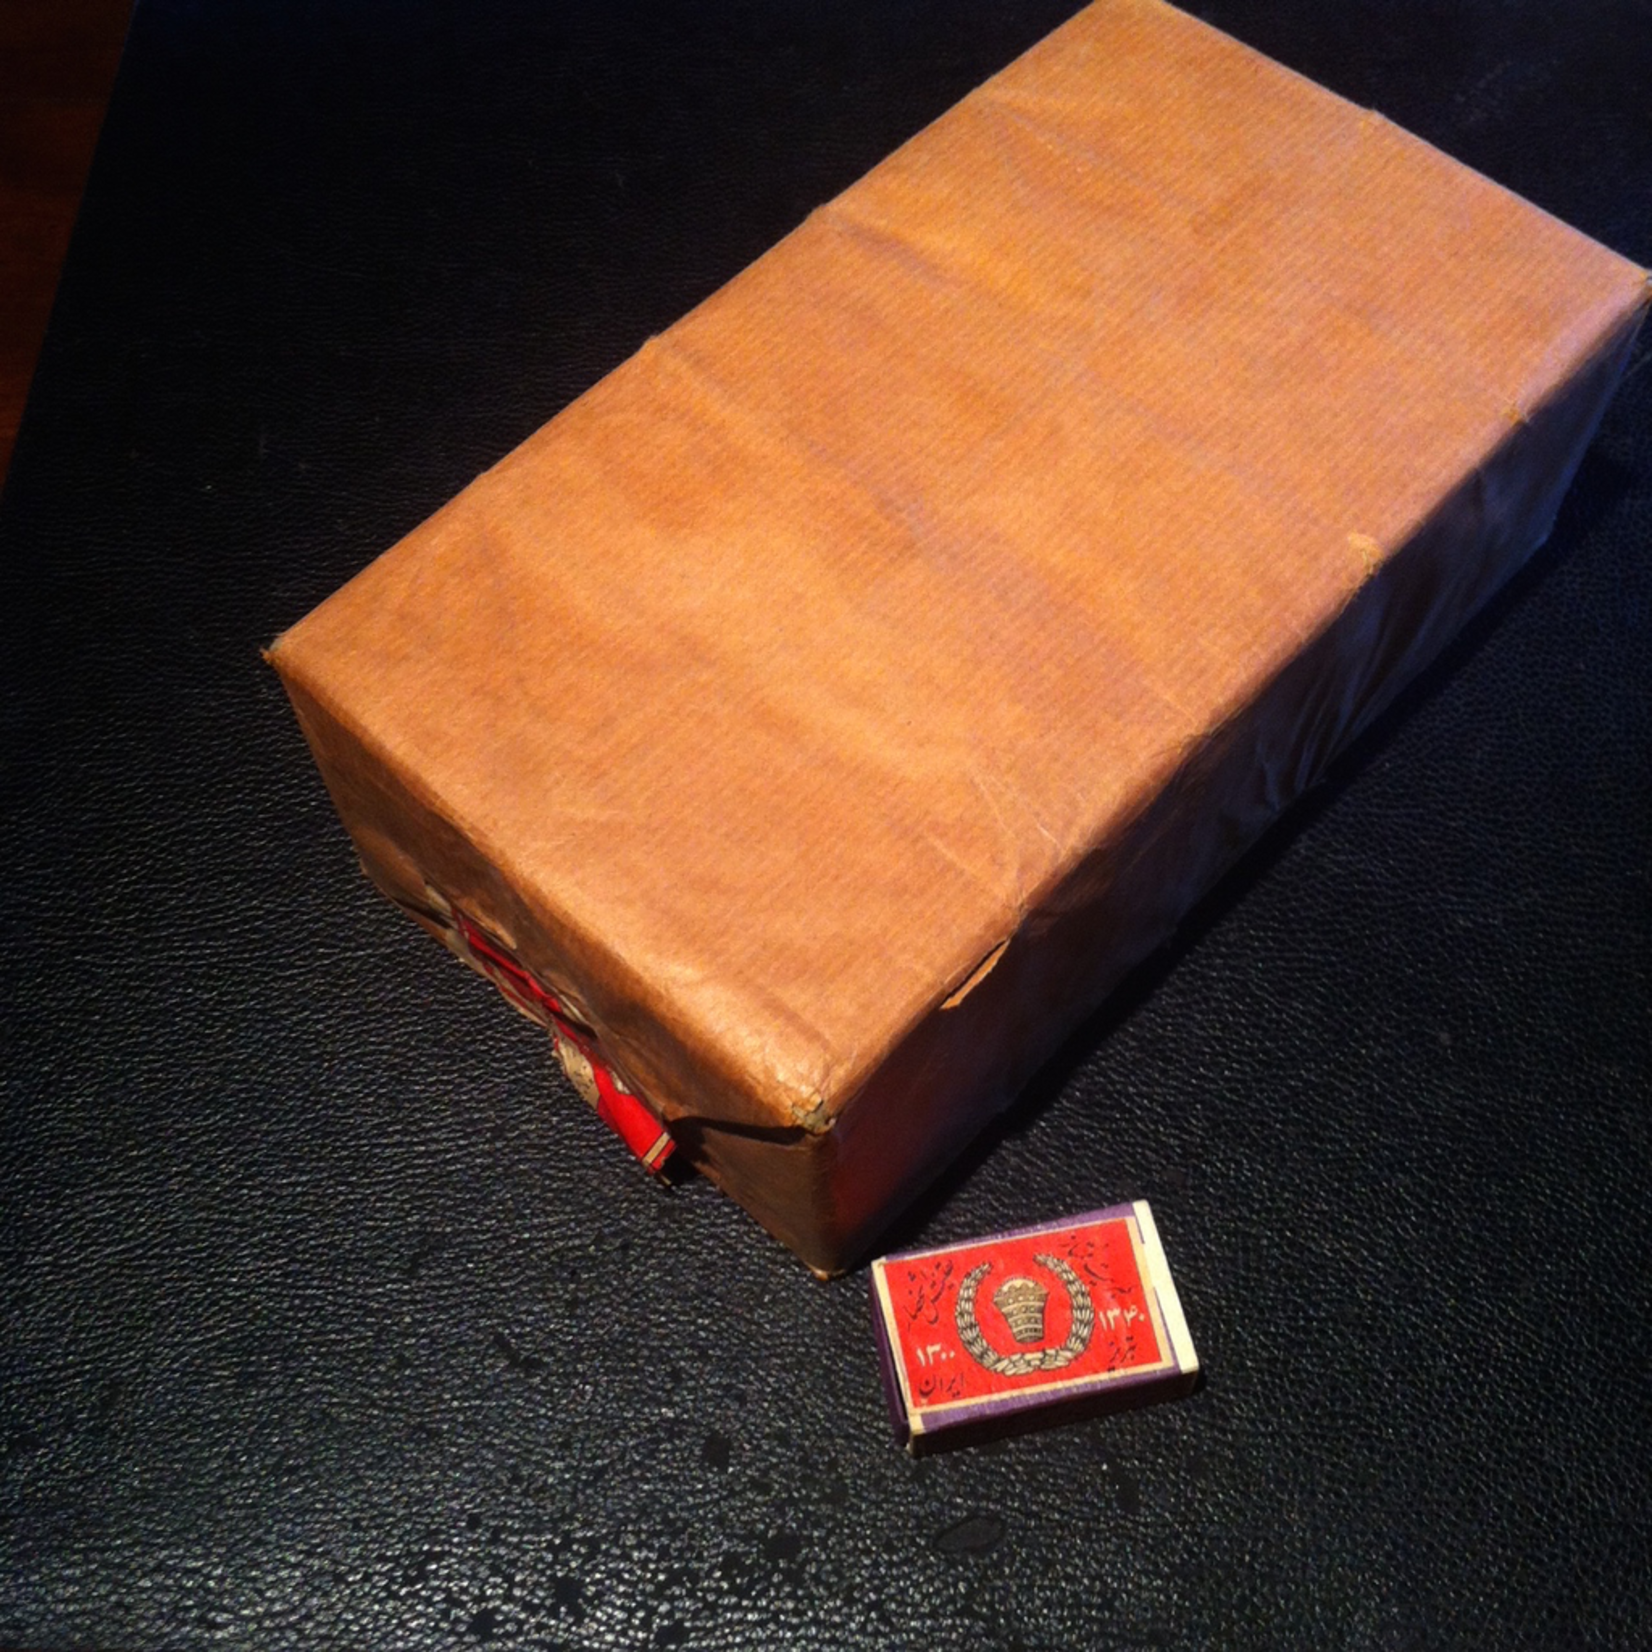 TAJHOME MATCH BOX